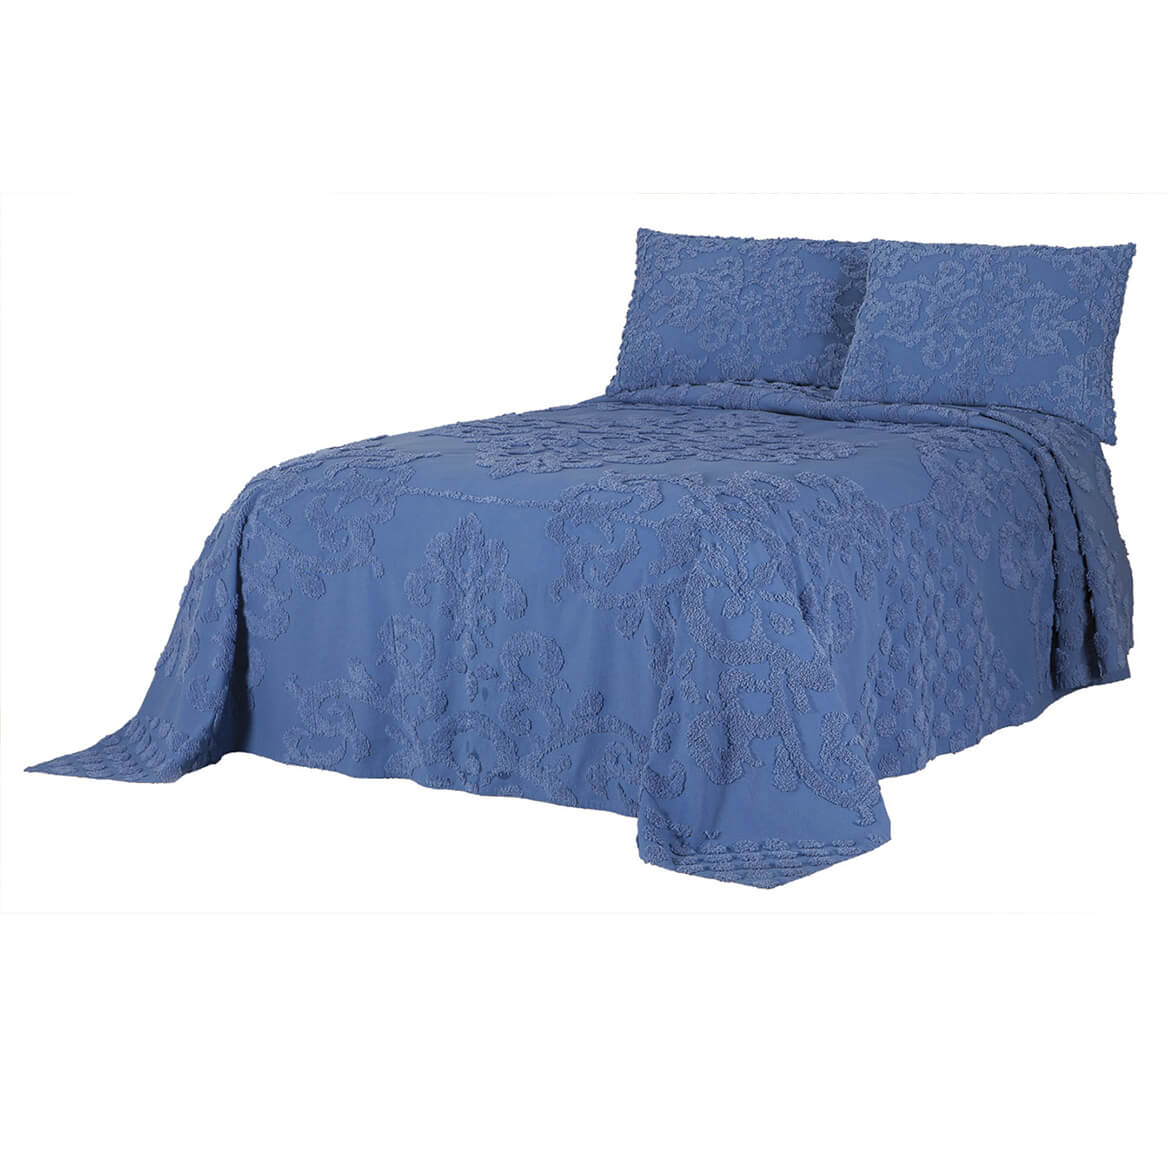 The Florence Chenille Bedspread by OakRidgeTM